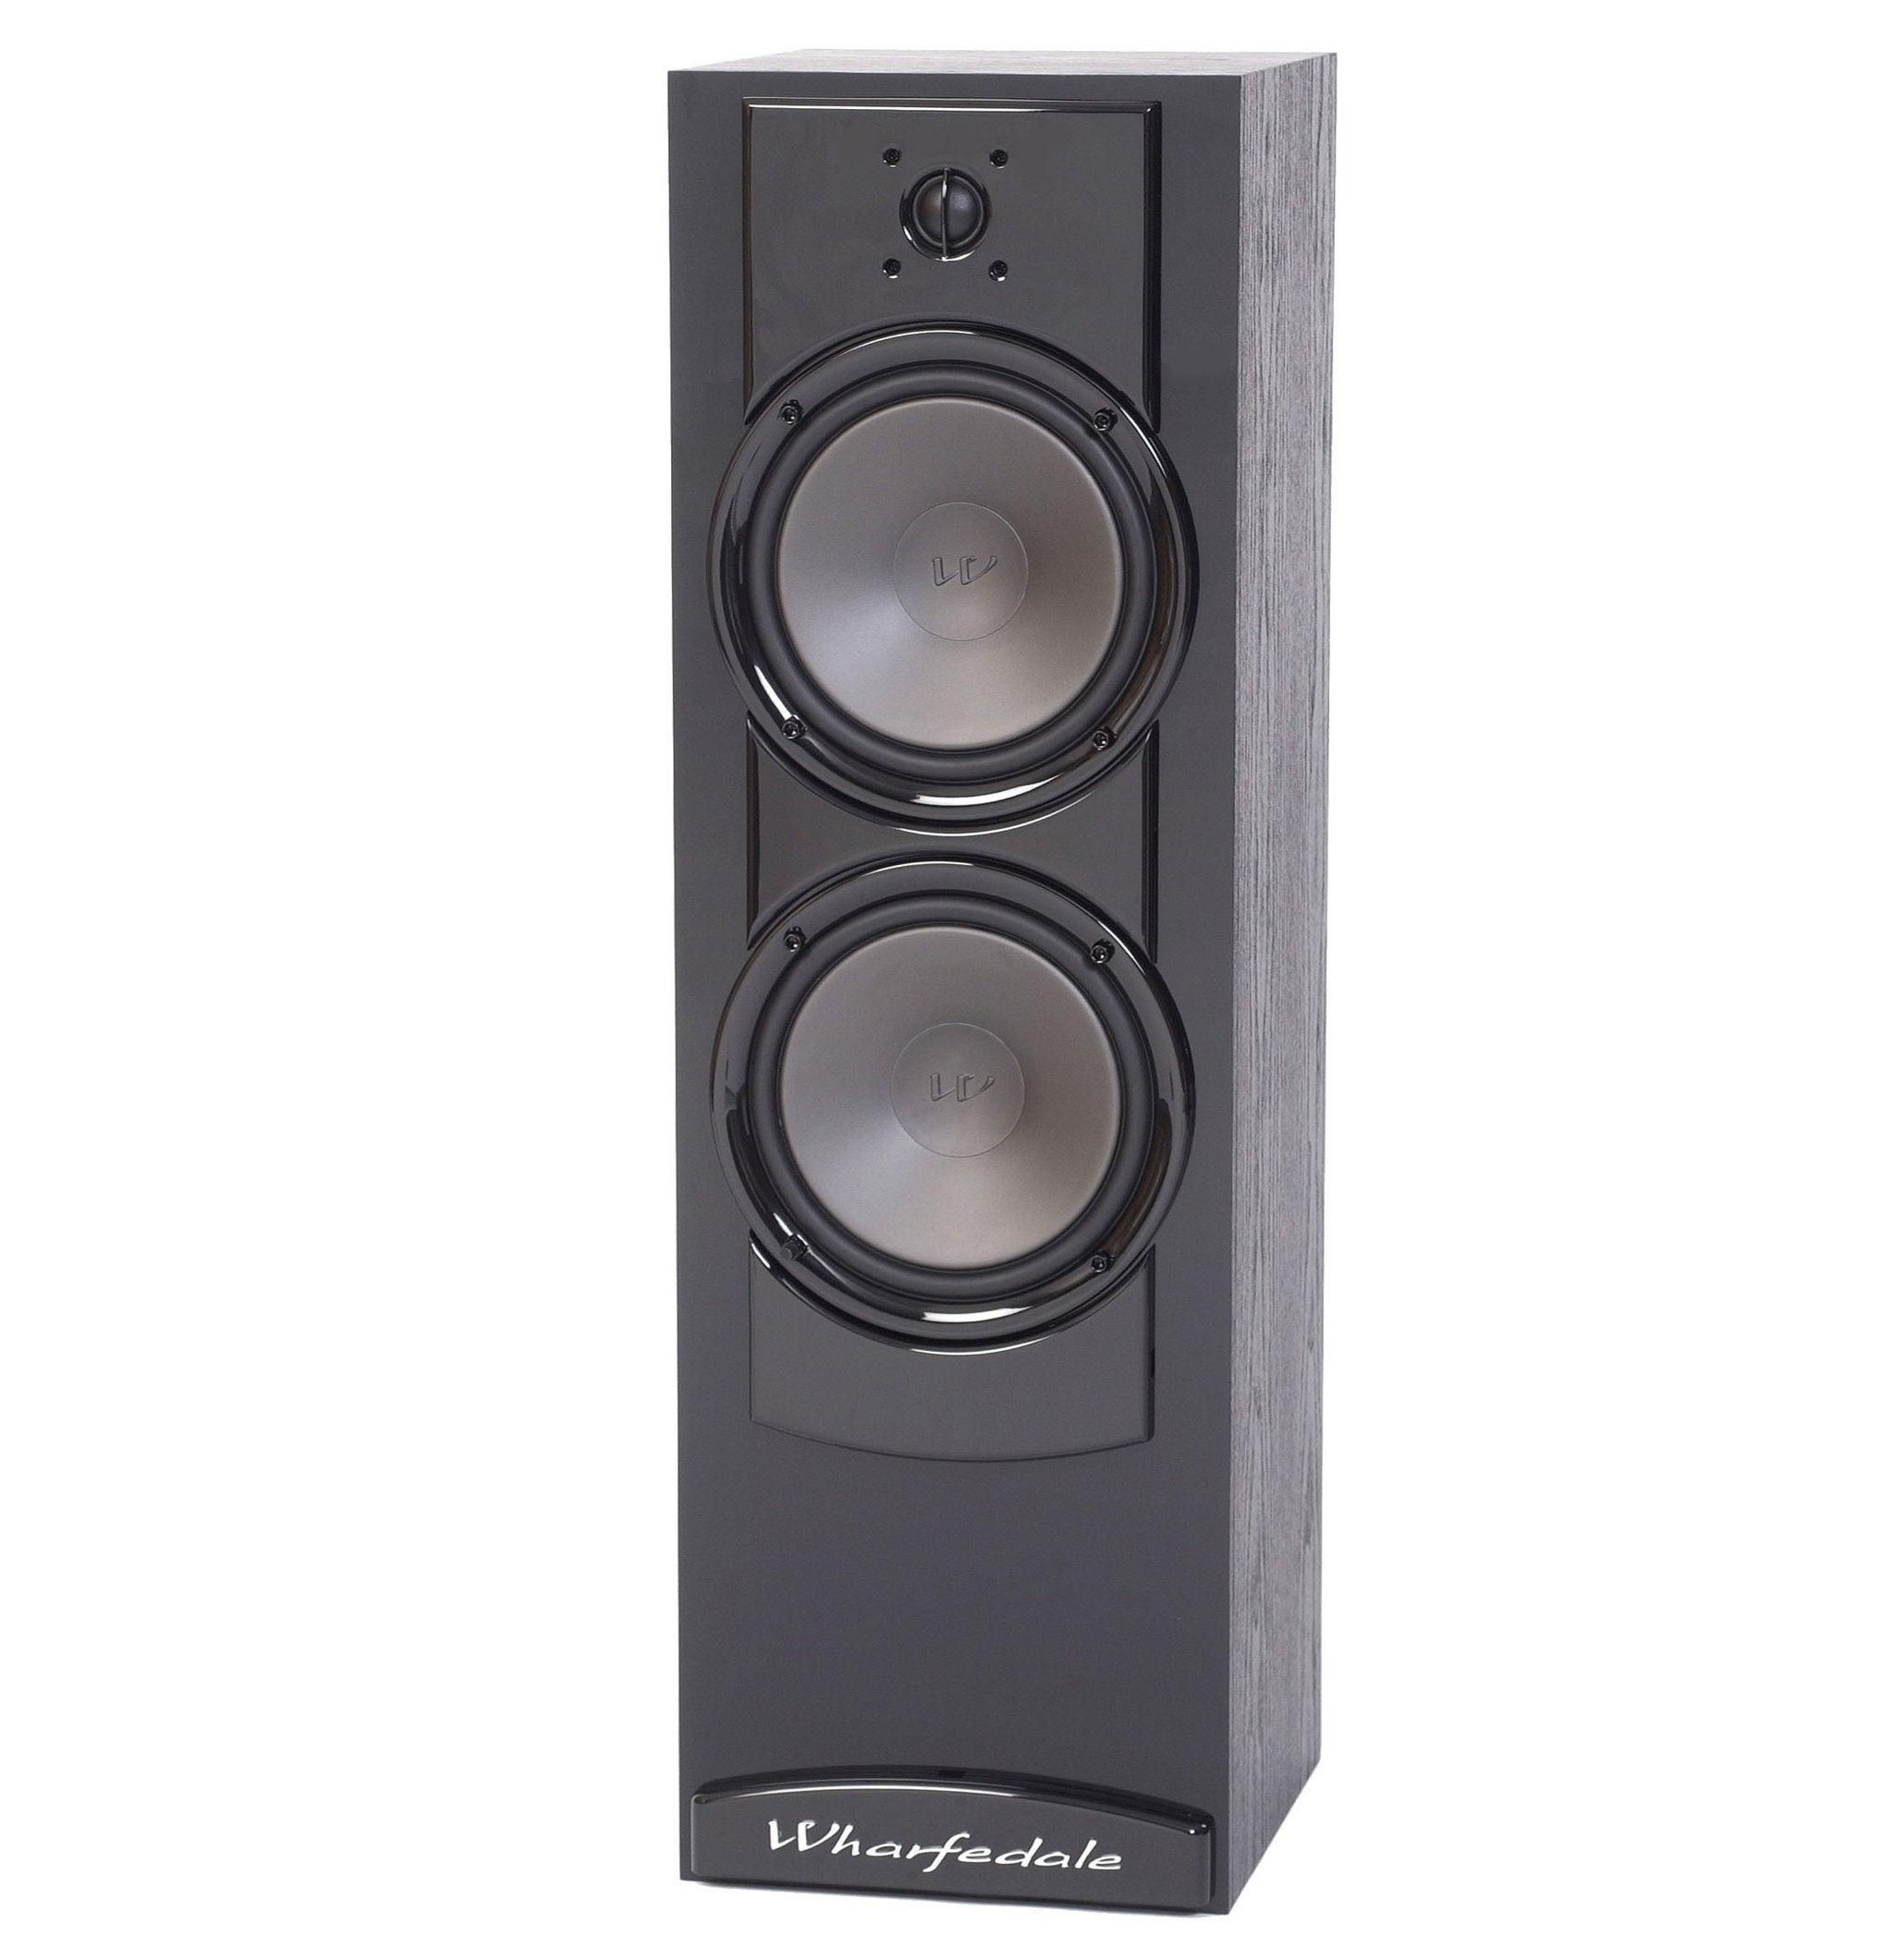 Wharfedale AT-400-HG Speaker